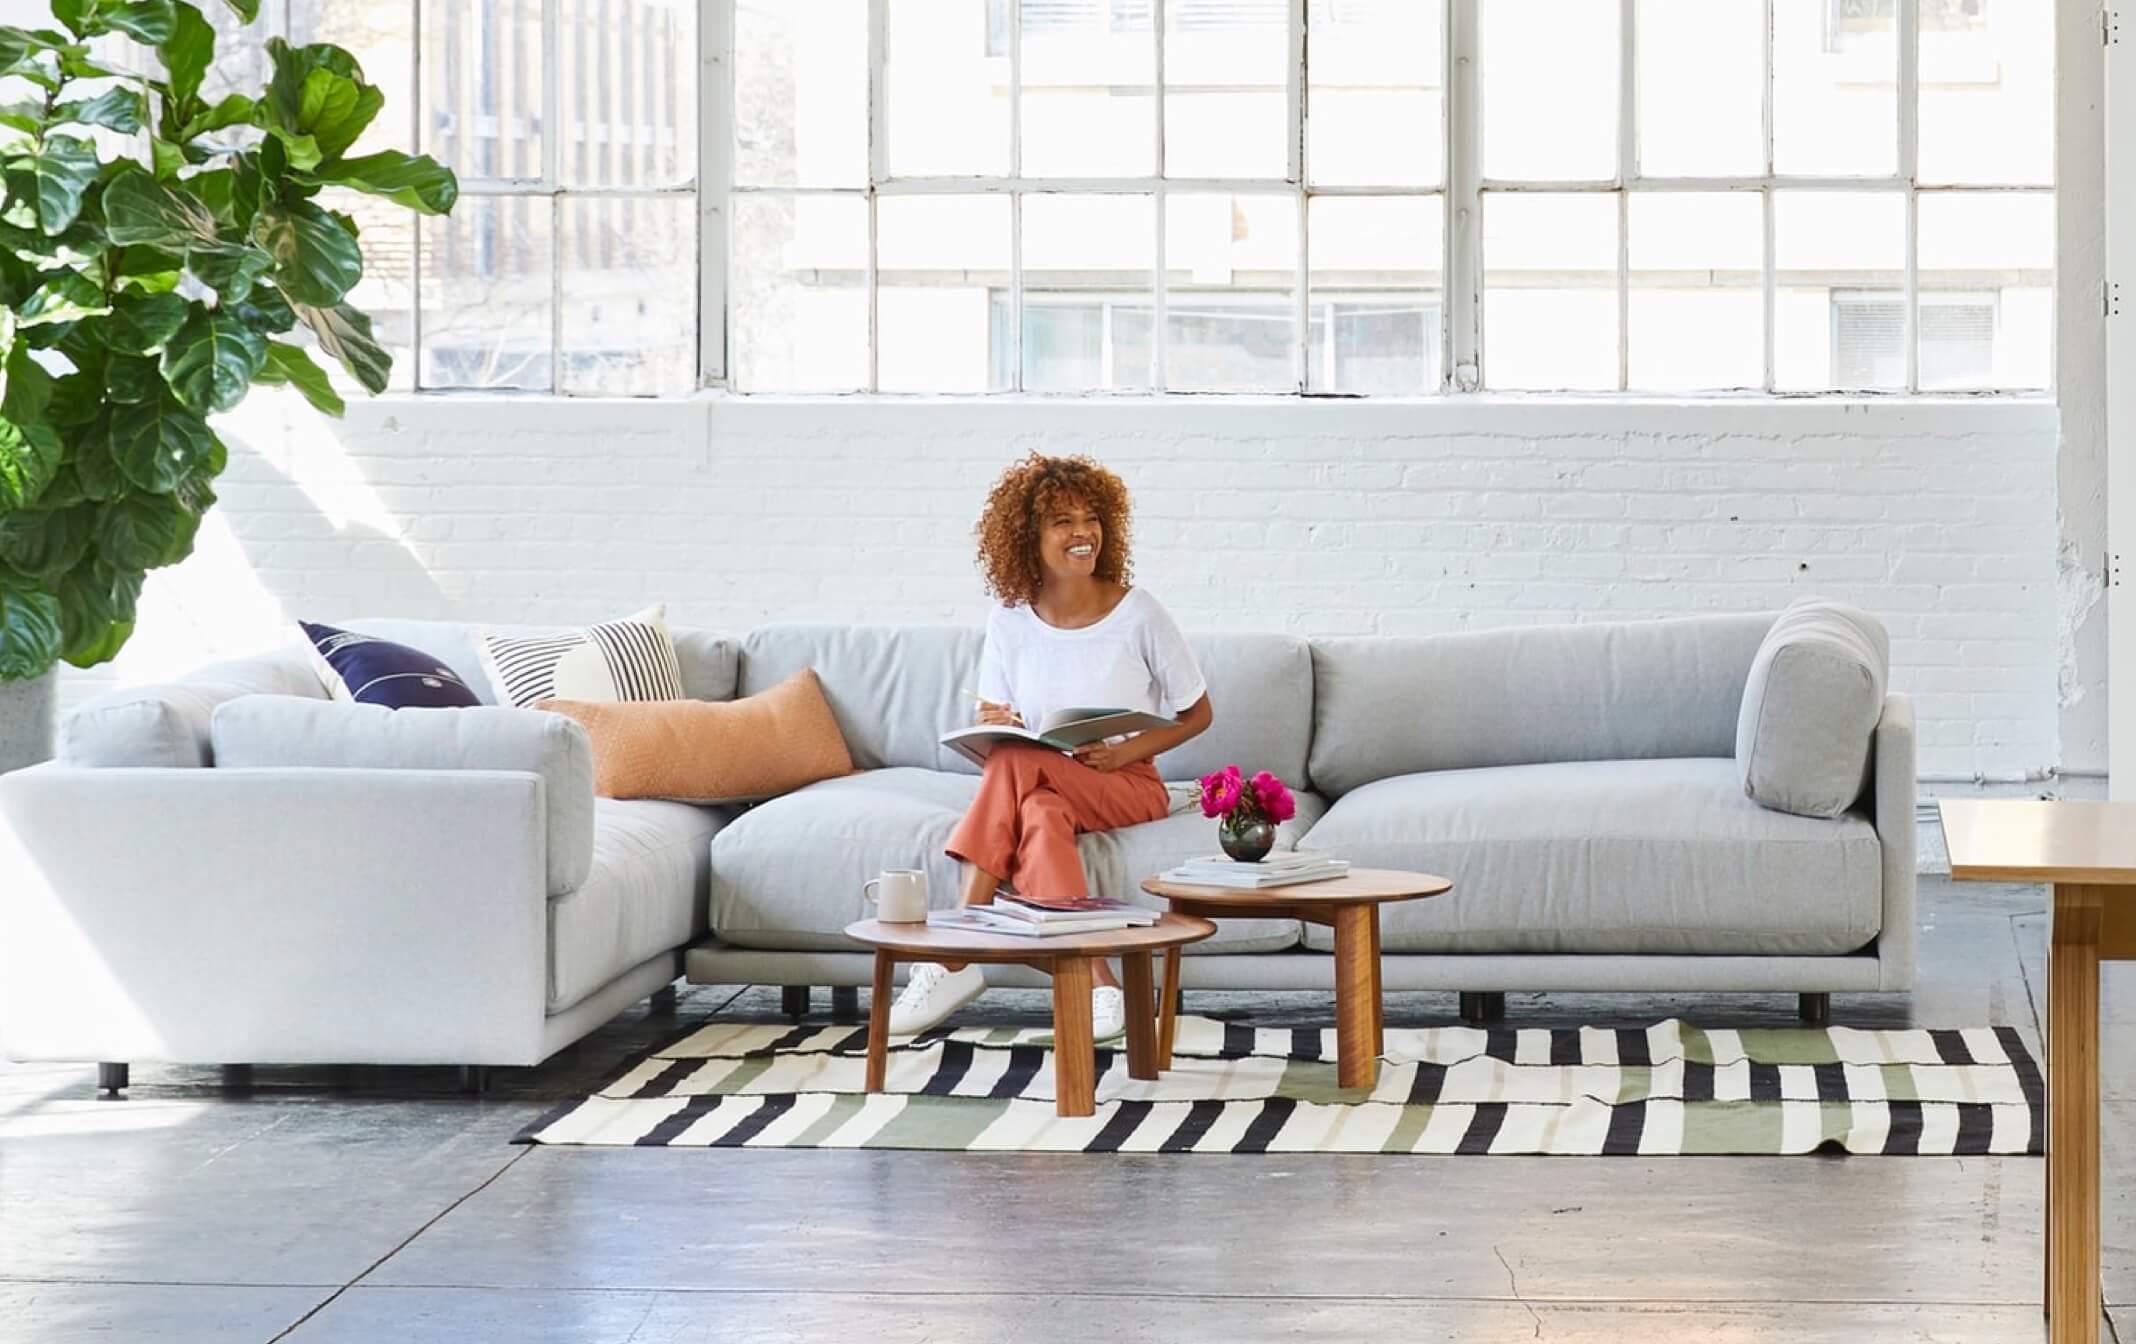 Woman enjoying living room